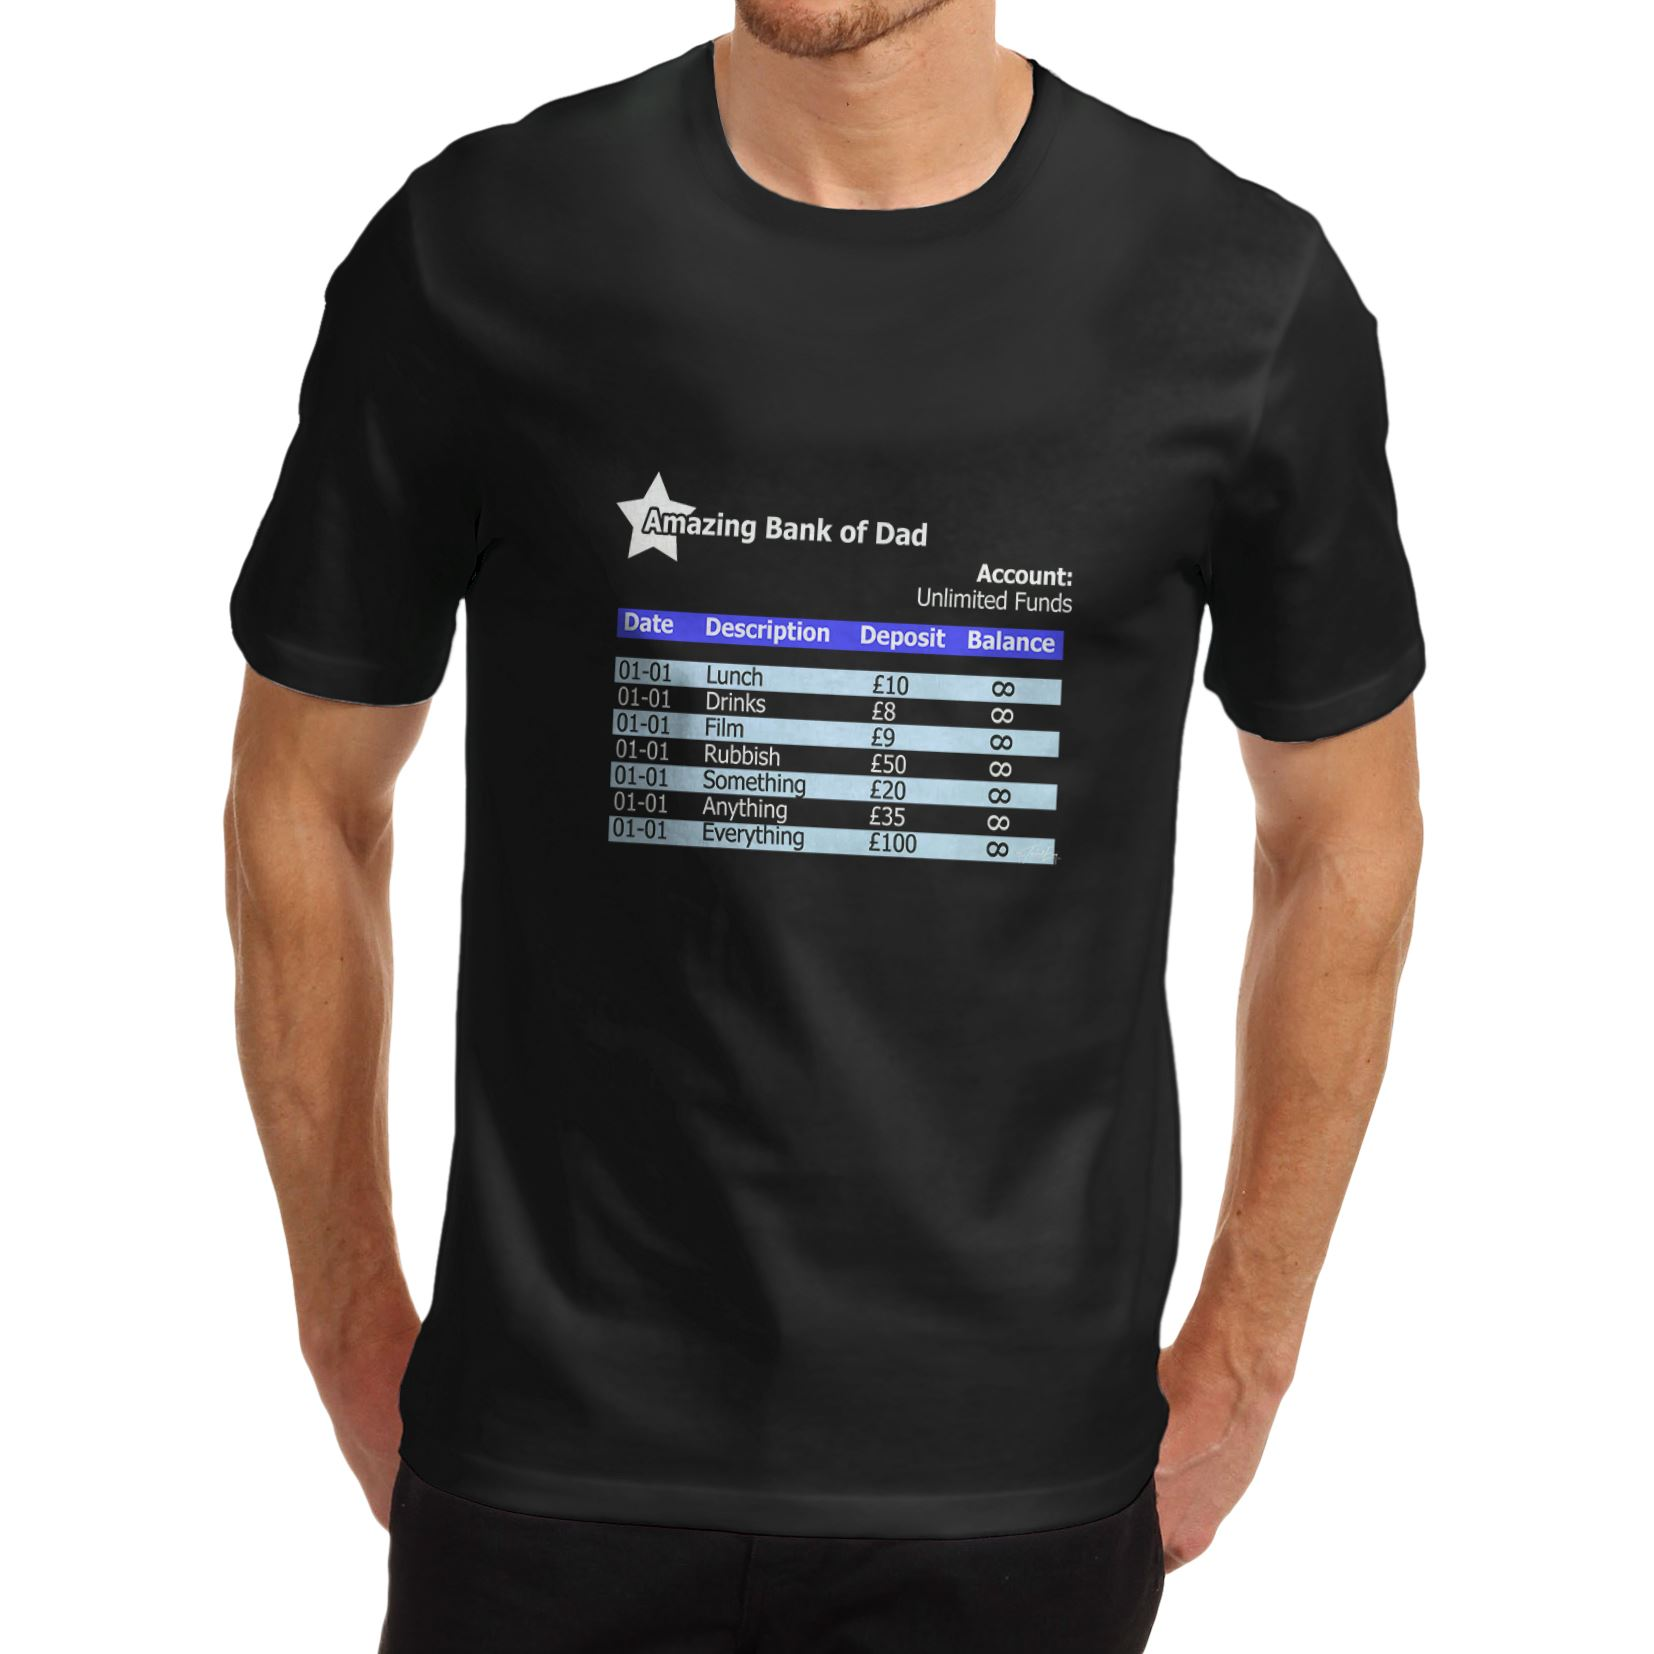 Hot Water Music Shirt Nissan Almera Audio Wiring Diagram 2017 Sale New Men 39s T Hilarious Design Gift